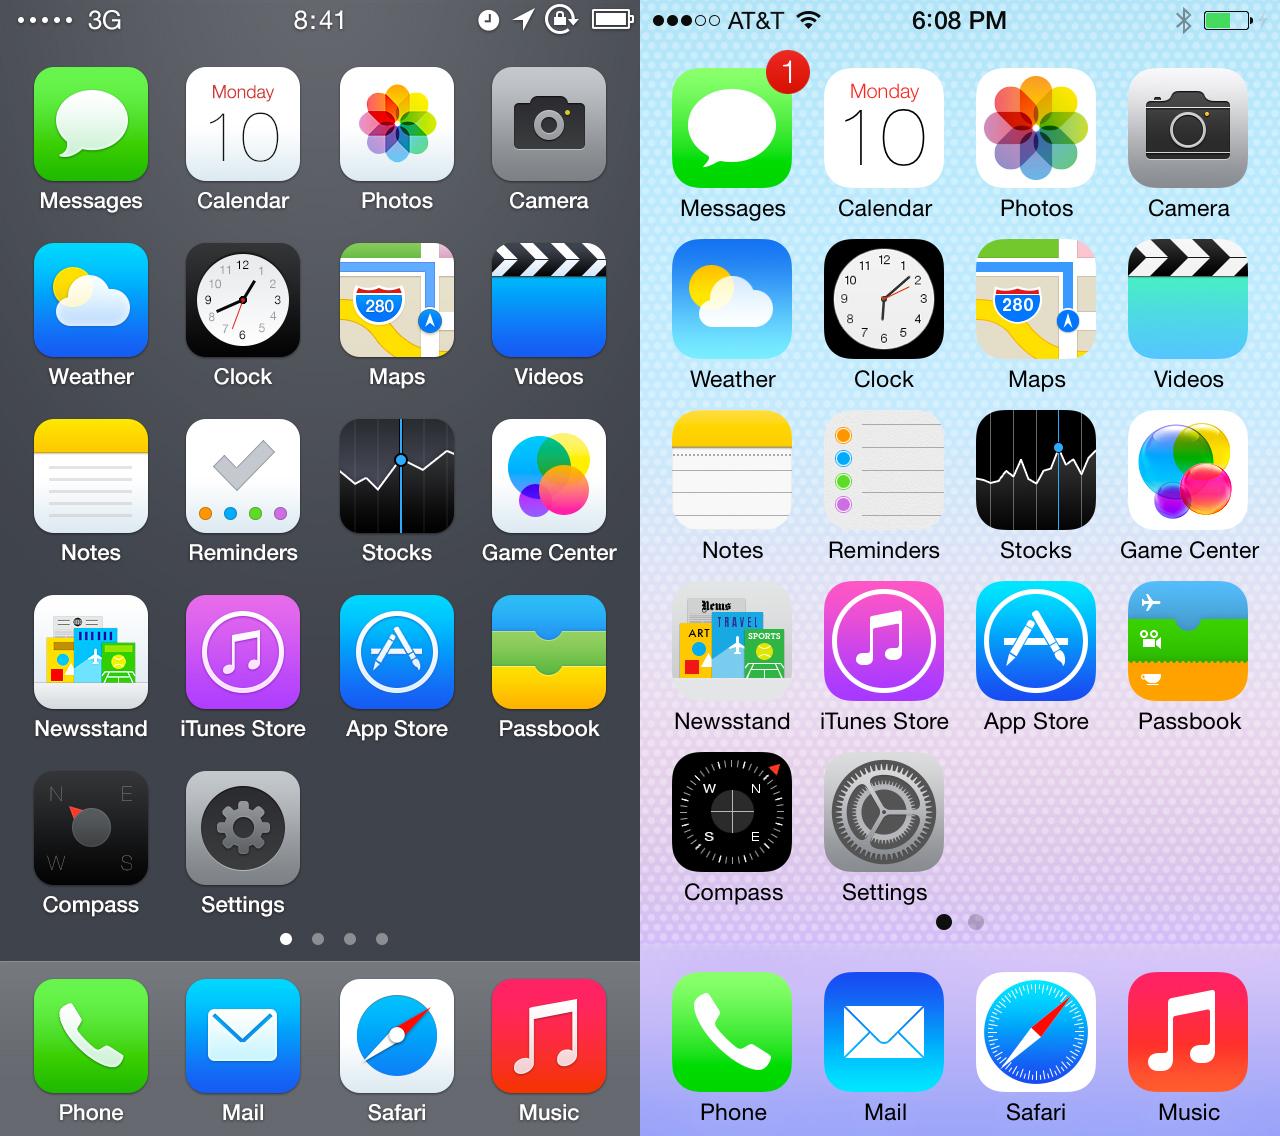 Redesign_iOS7_Comparison_V2